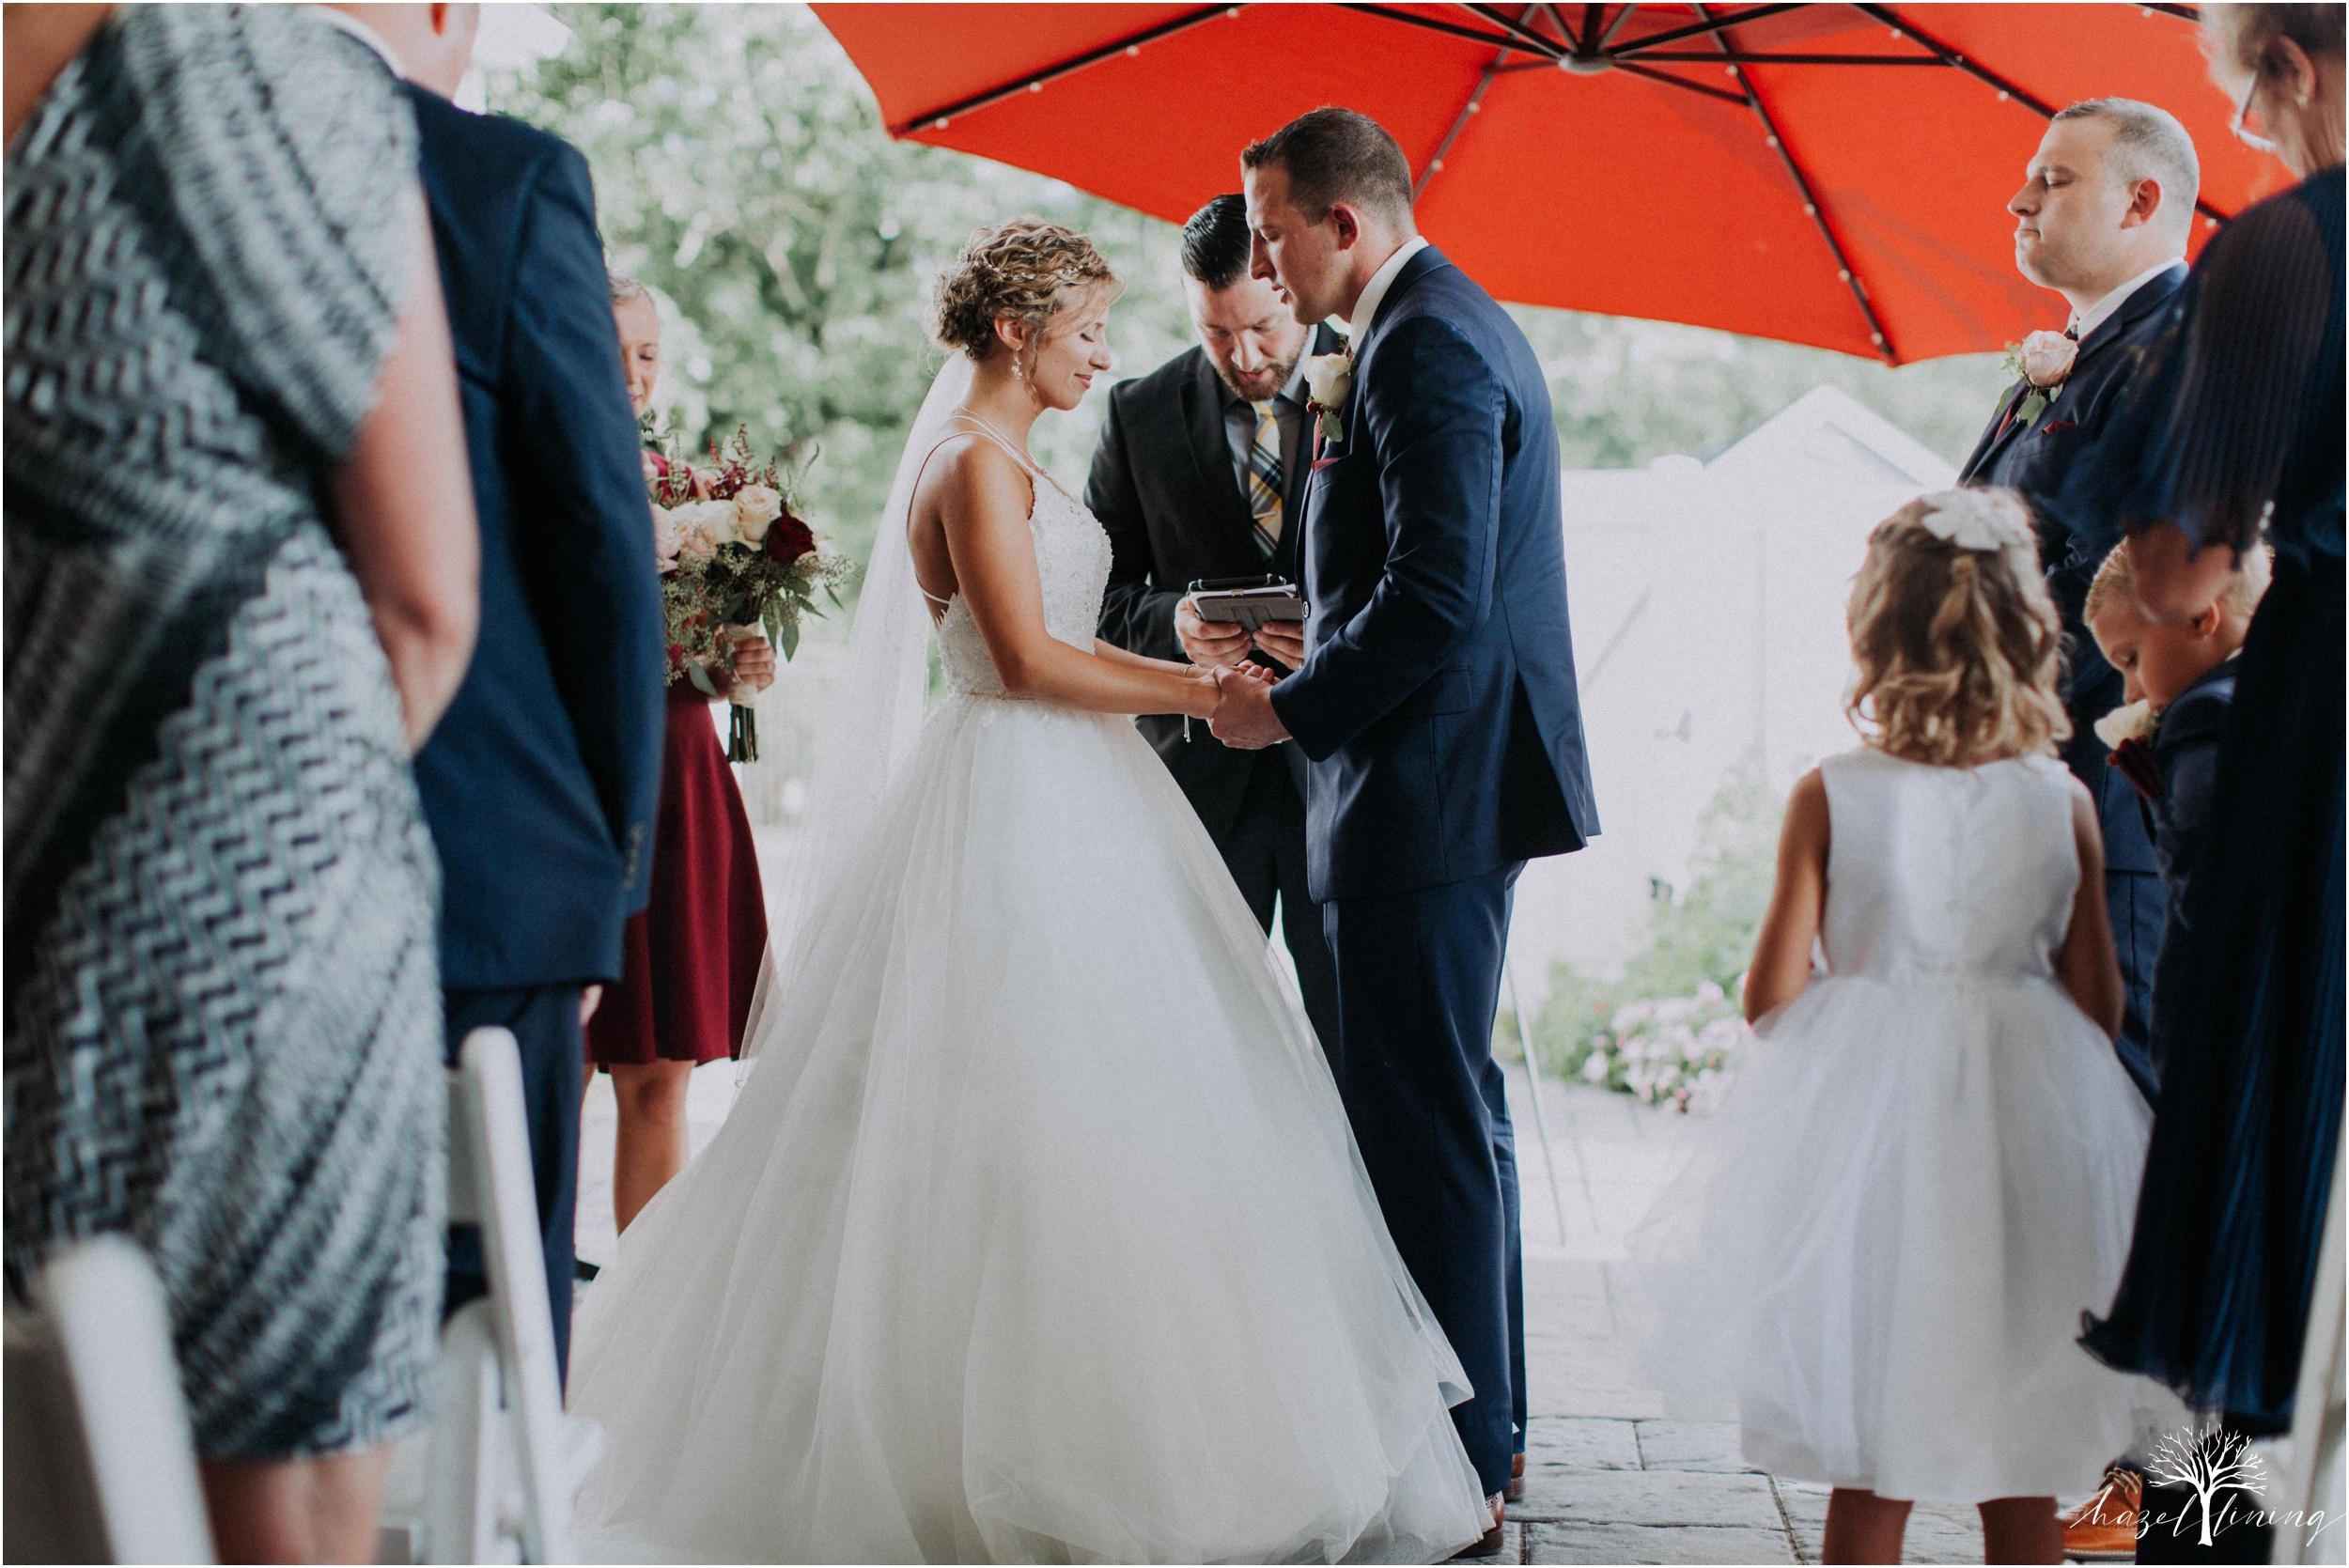 jonathan-weibel-becky-haywood-loft-at-sweetwater-cc-pennsburg-pennsylvania-rainy-day-summer-wedding-hazel-lining-travel-wedding-elopement-photography_0056.jpg